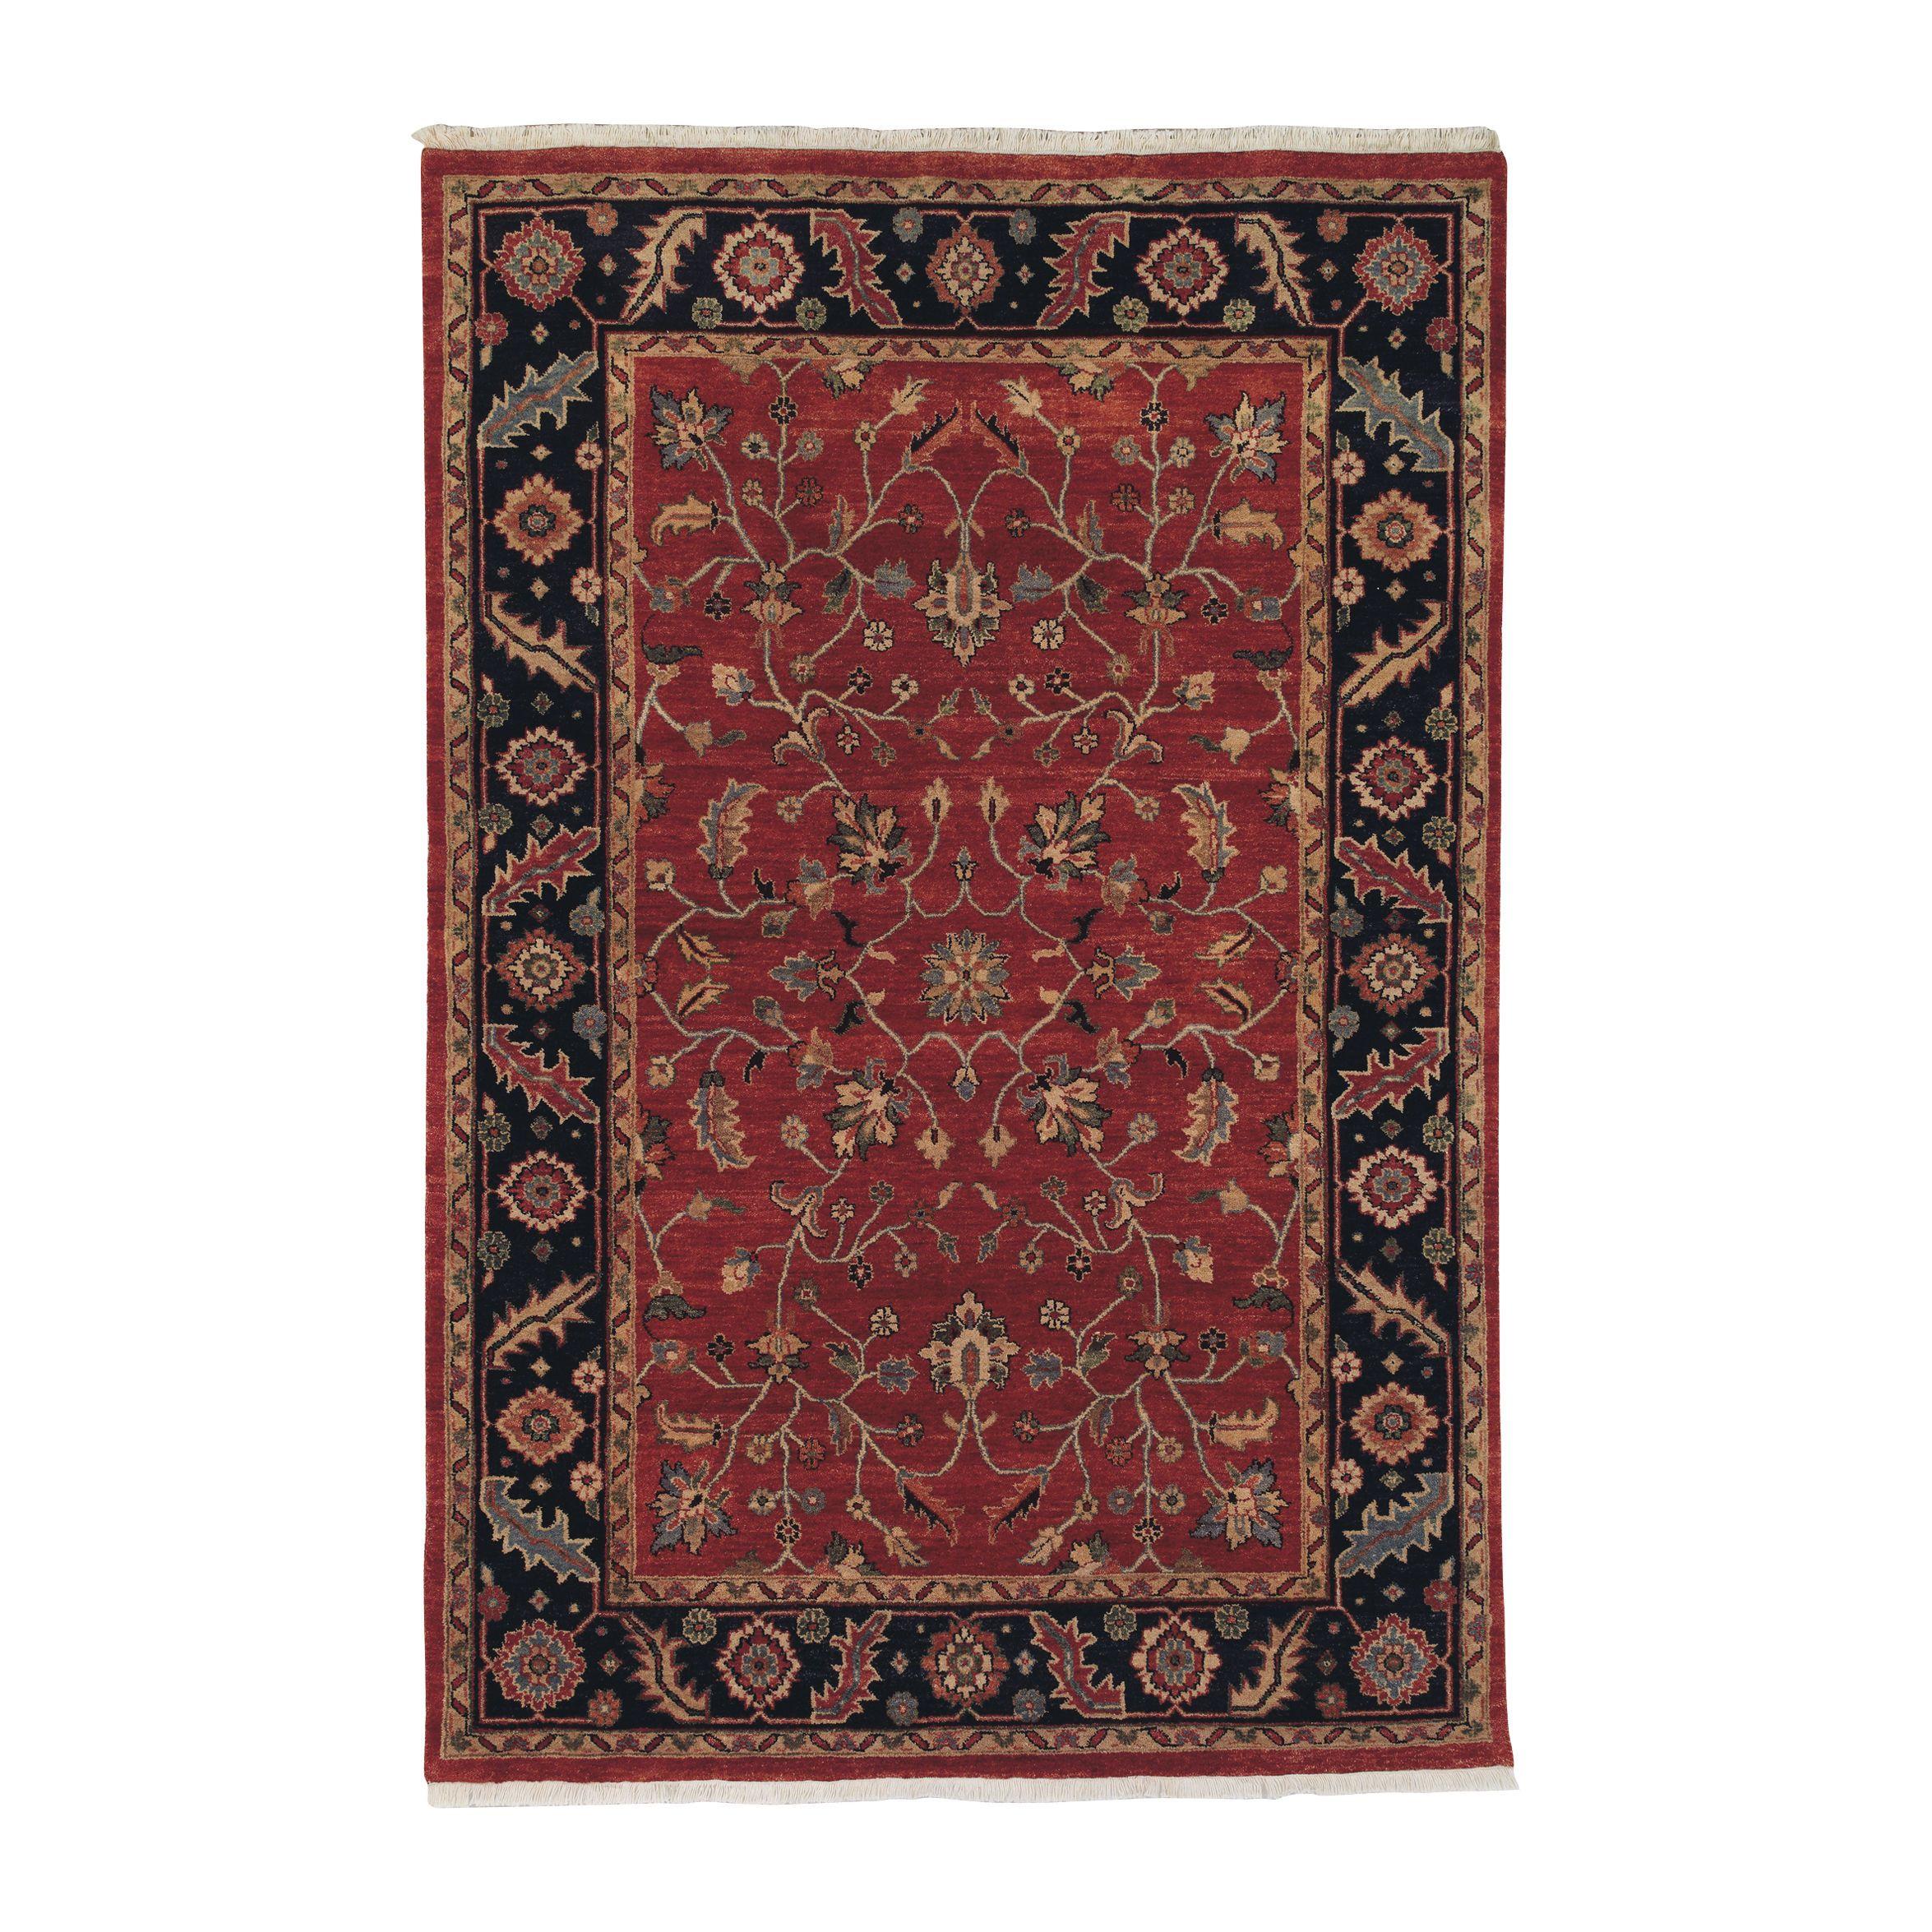 Mughal Kashan Rug Red Blue Ethan Allen Us Rugs Rug Shopping Kashan Rug